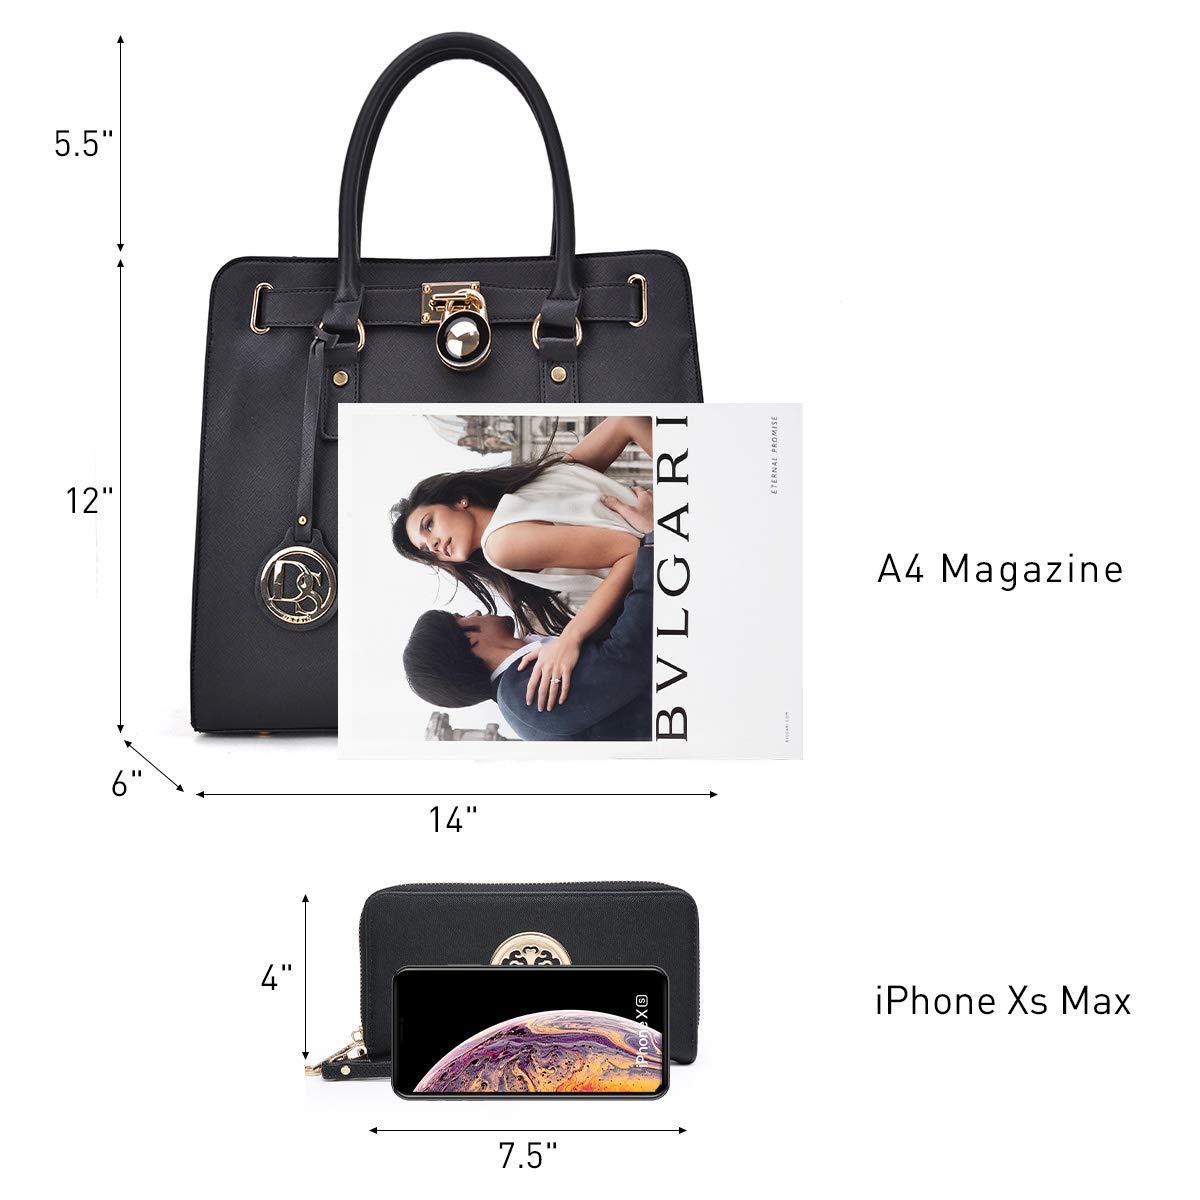 Women/'s Fashion Handbag Top Belted Padlock Satchel Bag Top Handle Shoulder Bag Purses w//Matching Wallet